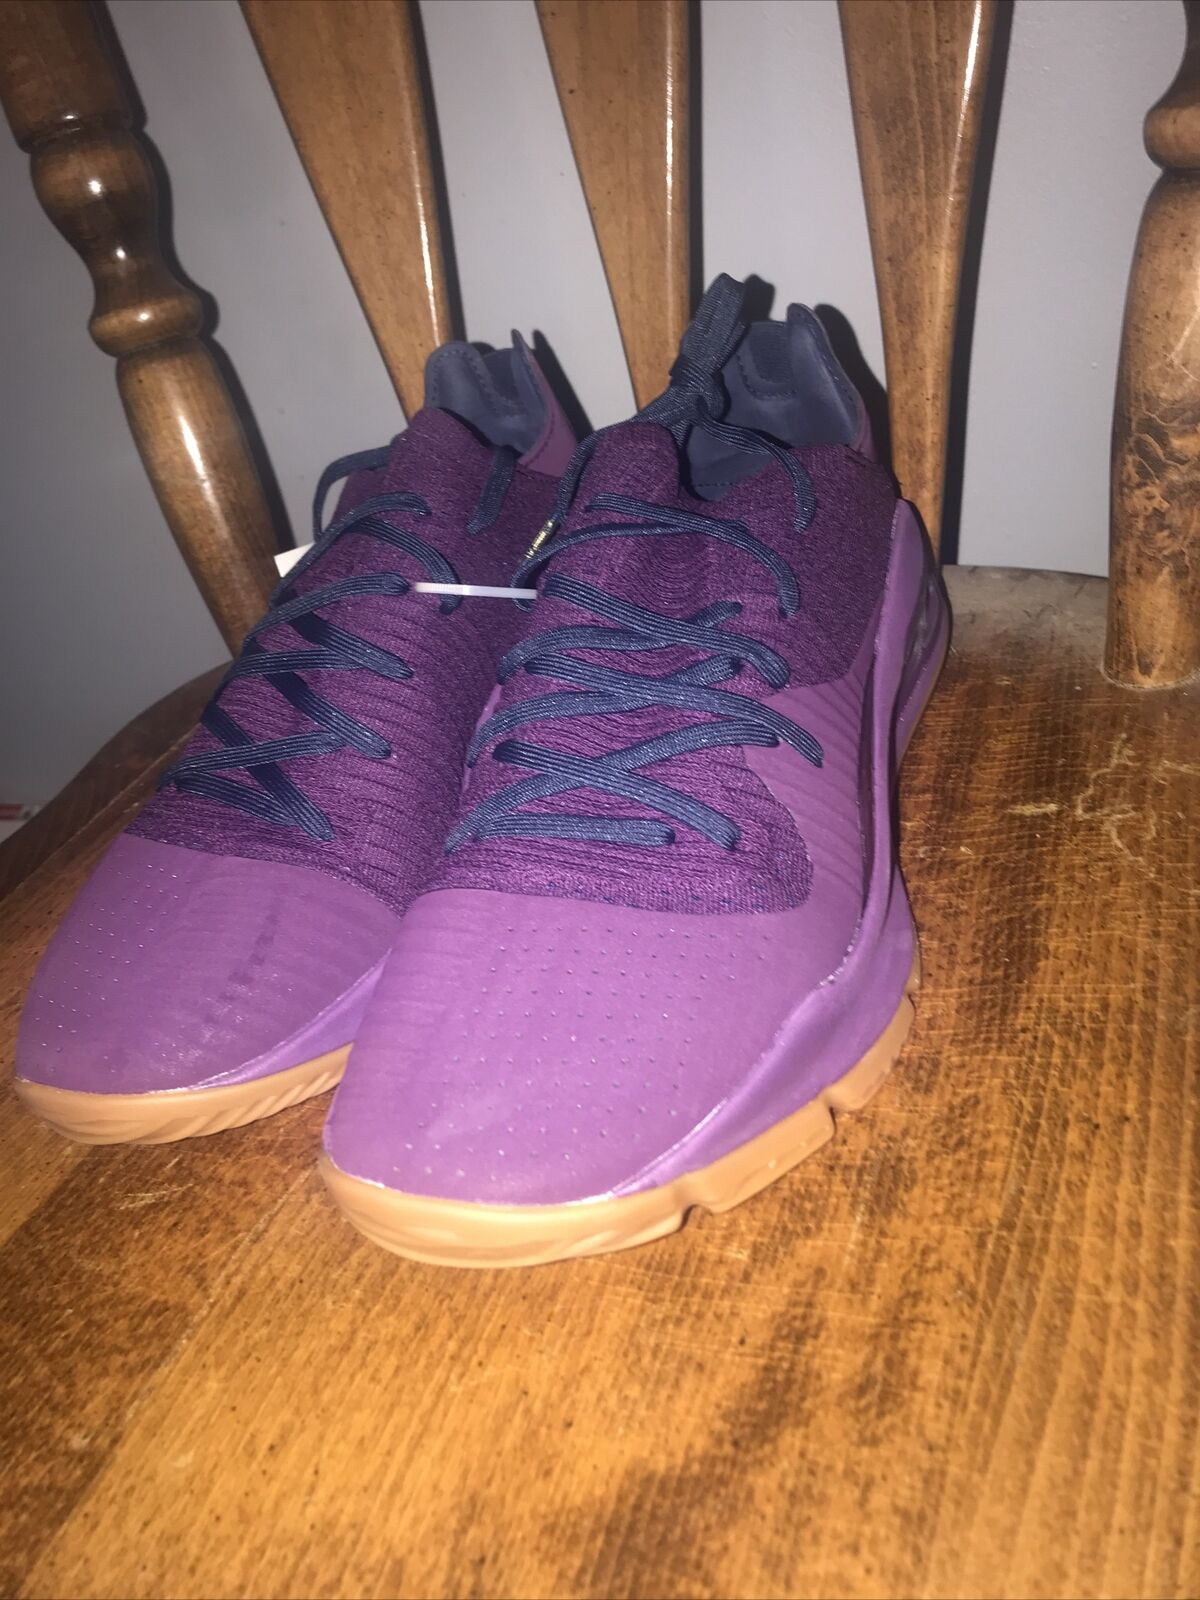 Under Armour Curry 4 Low Mens Merlot Purple Basketball Shoes Sz 11.5 3000083-500